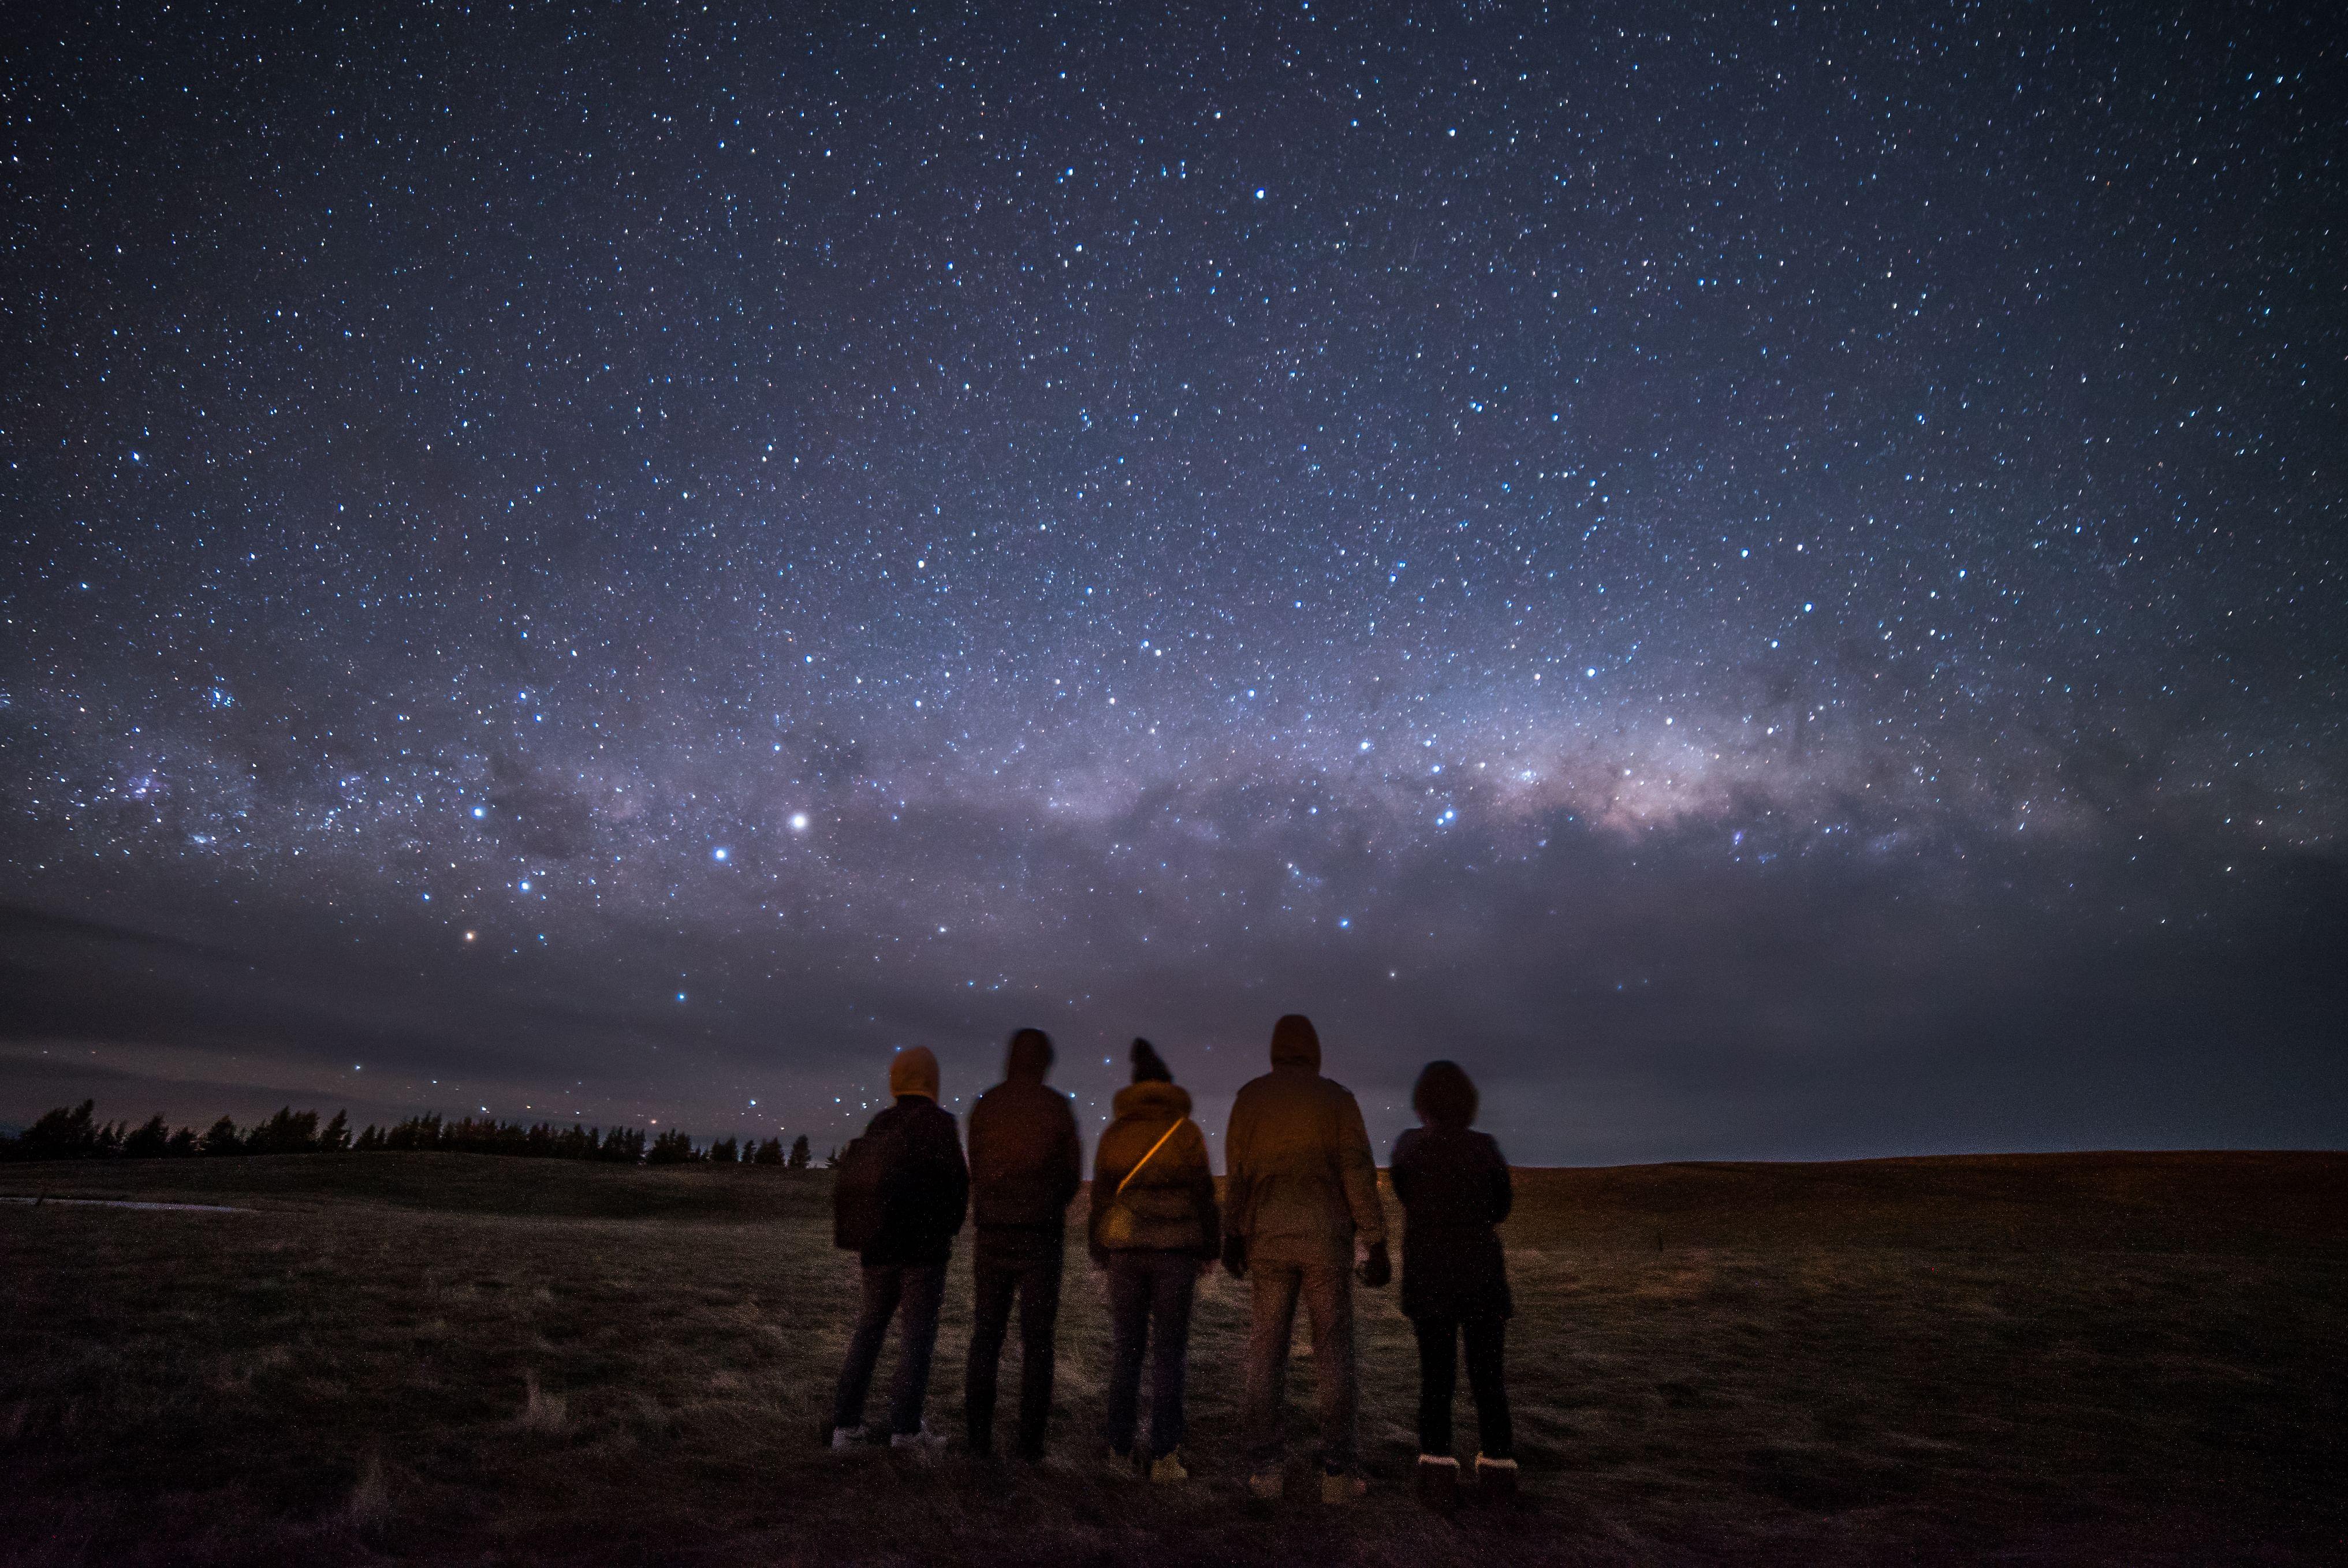 shooting the stars in new zealand s aoraki mackenzie dark sky